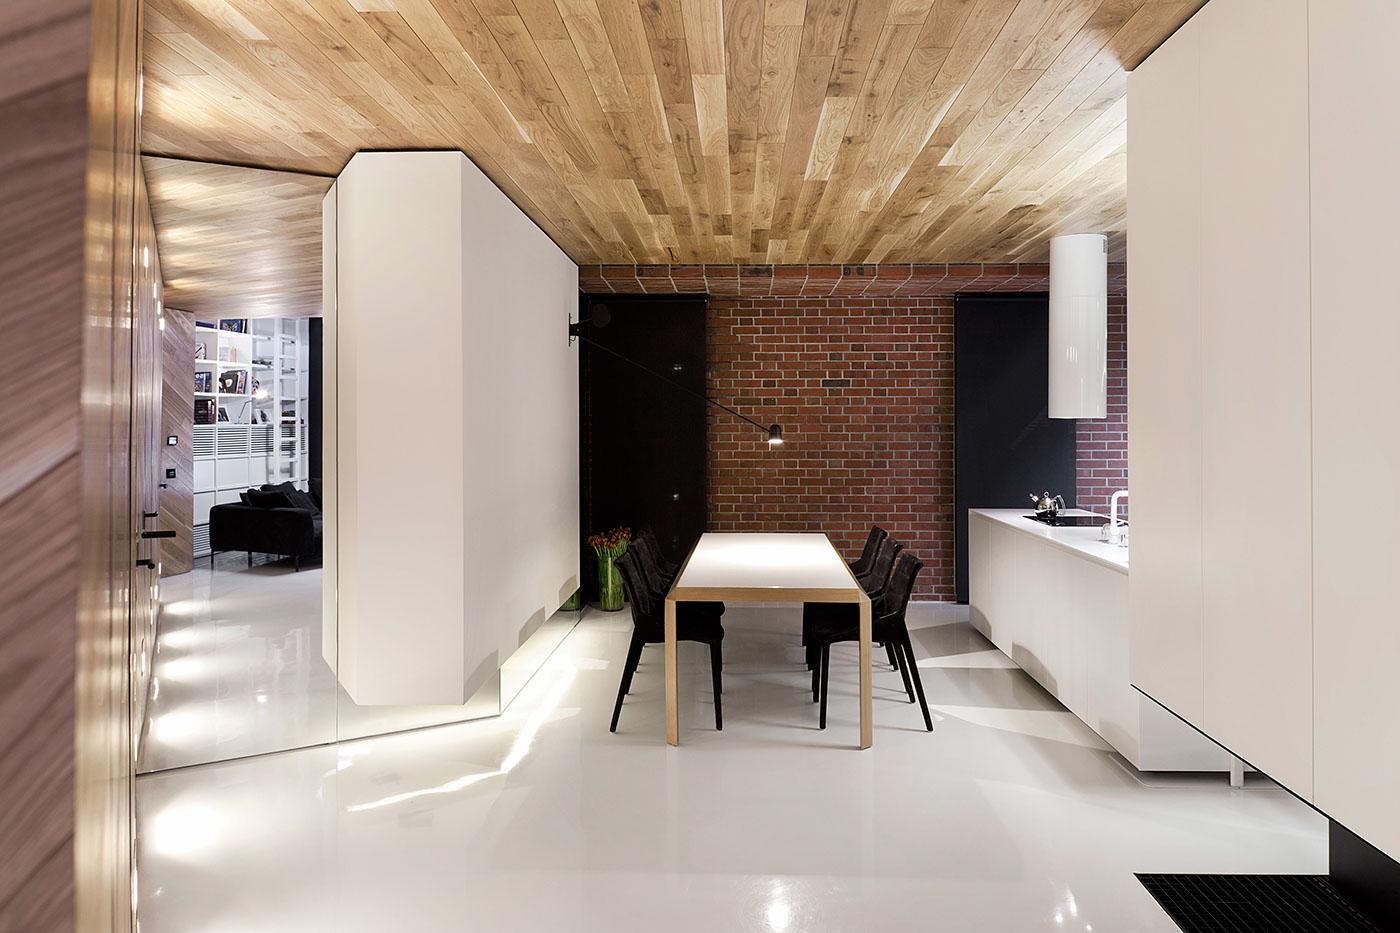 studio mode8 Loft Apartment By Studio Mode